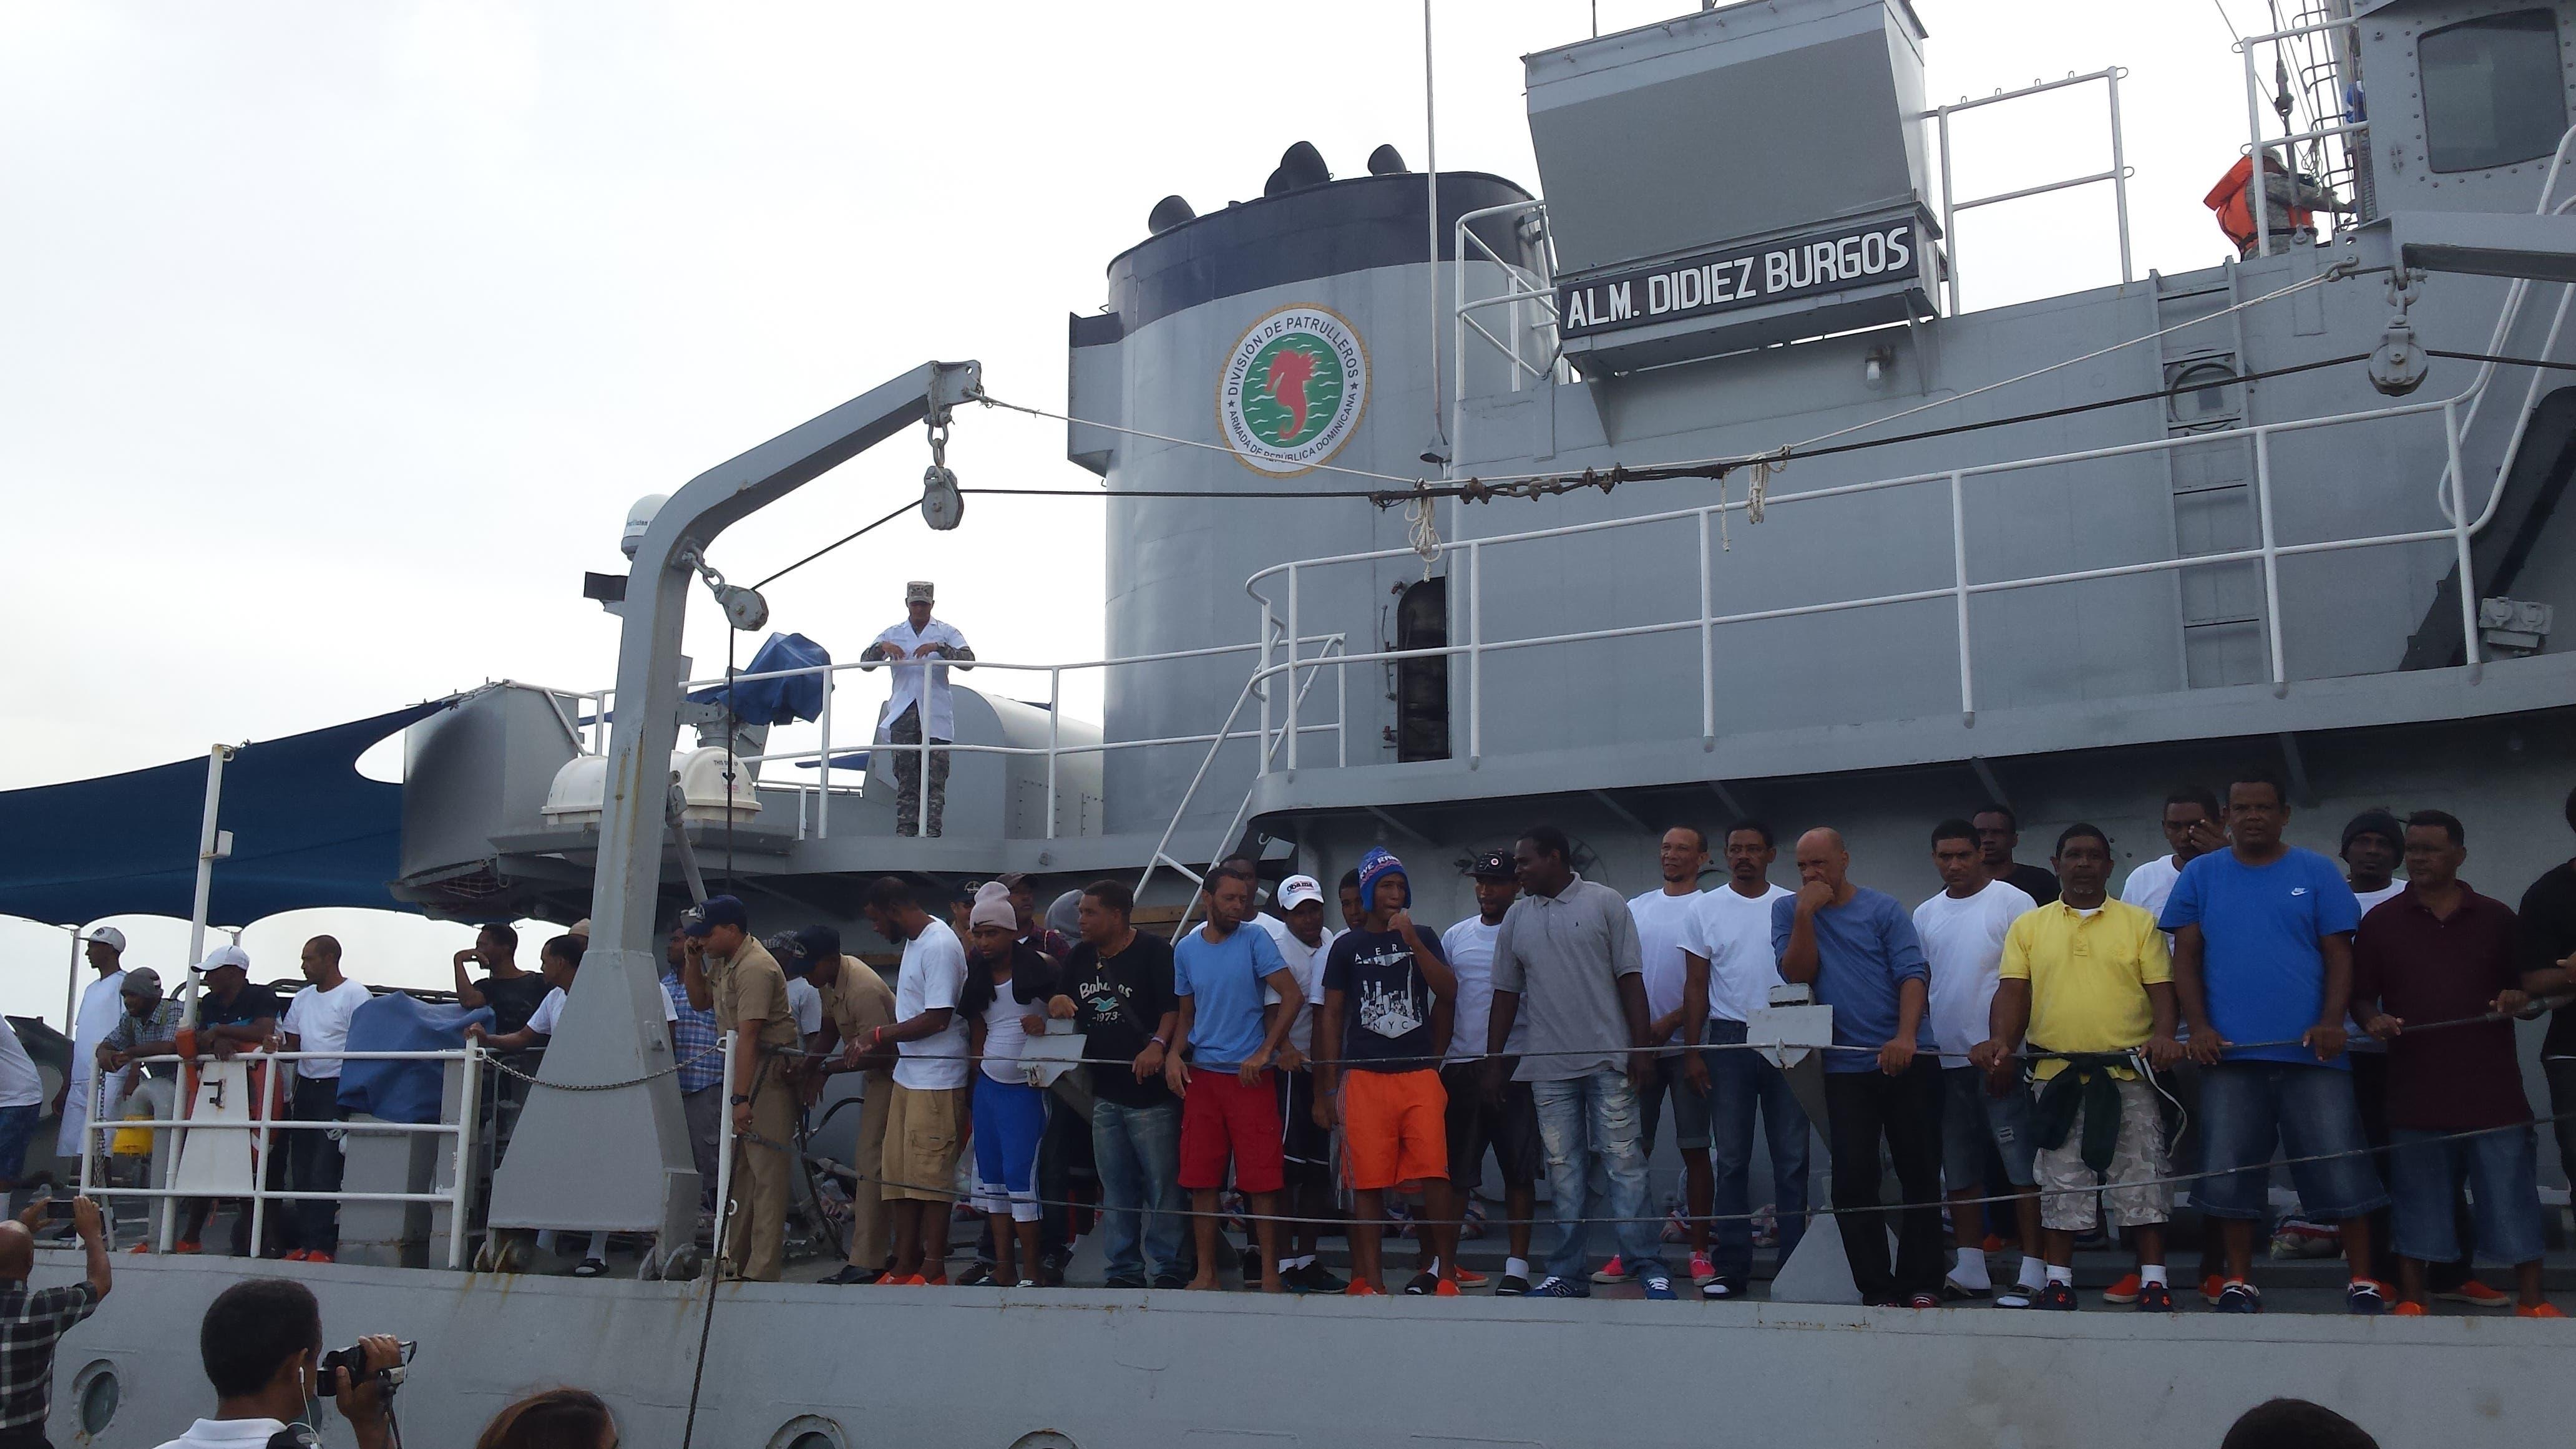 llegan-a-puerto-plata-50-pescadores-luego-de-estar-retenidos-8-meses-en-las-bahamas-4